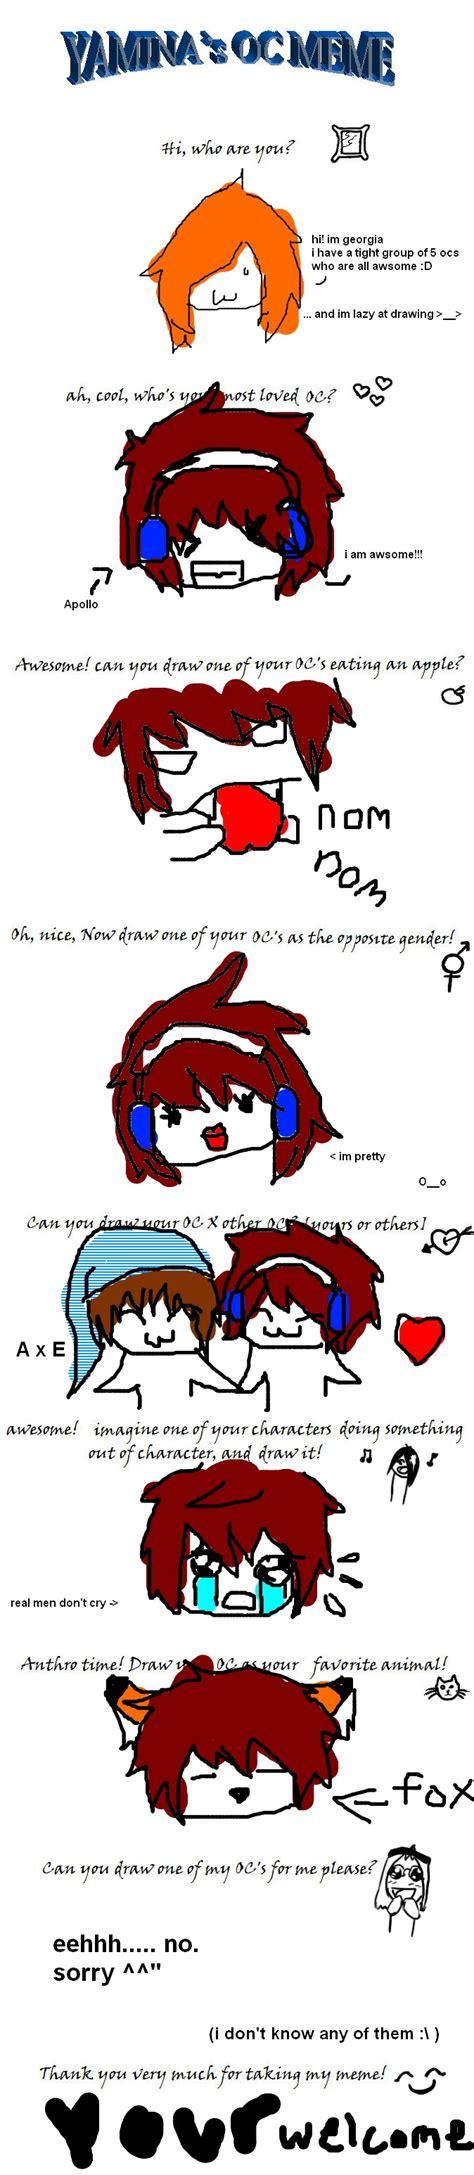 Original Character Meme - original character meme by georgiatheninja on deviantart